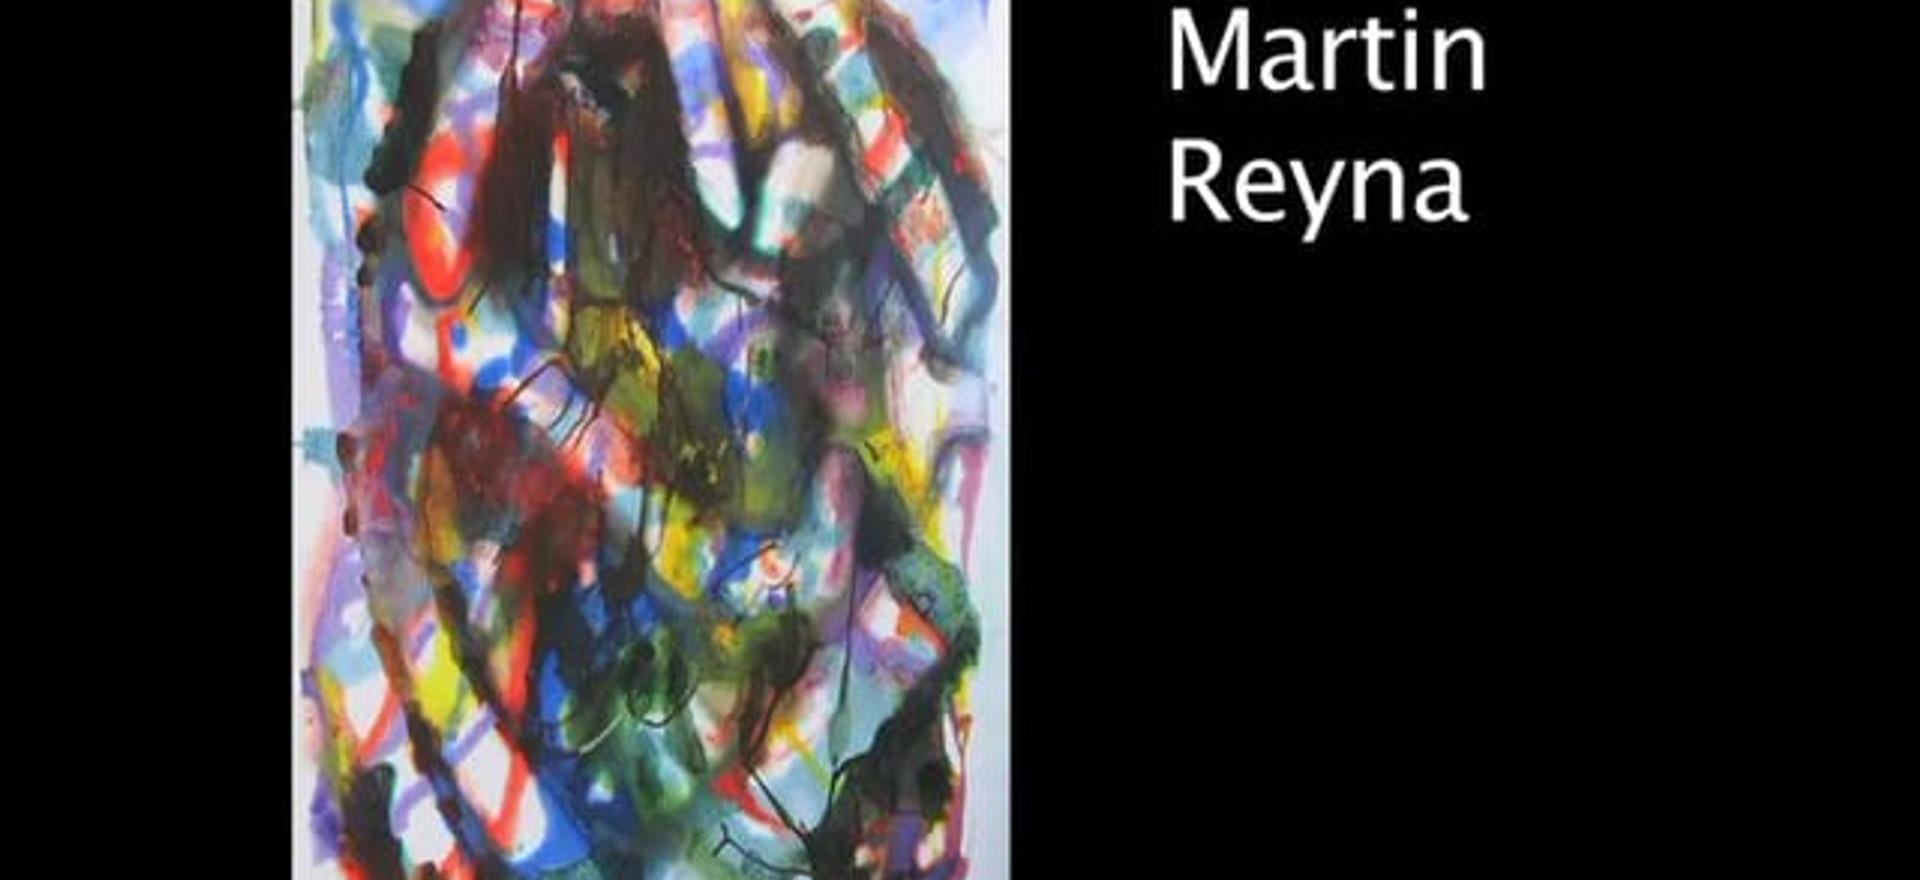 2012, Martin Reyna par Olivier Laly